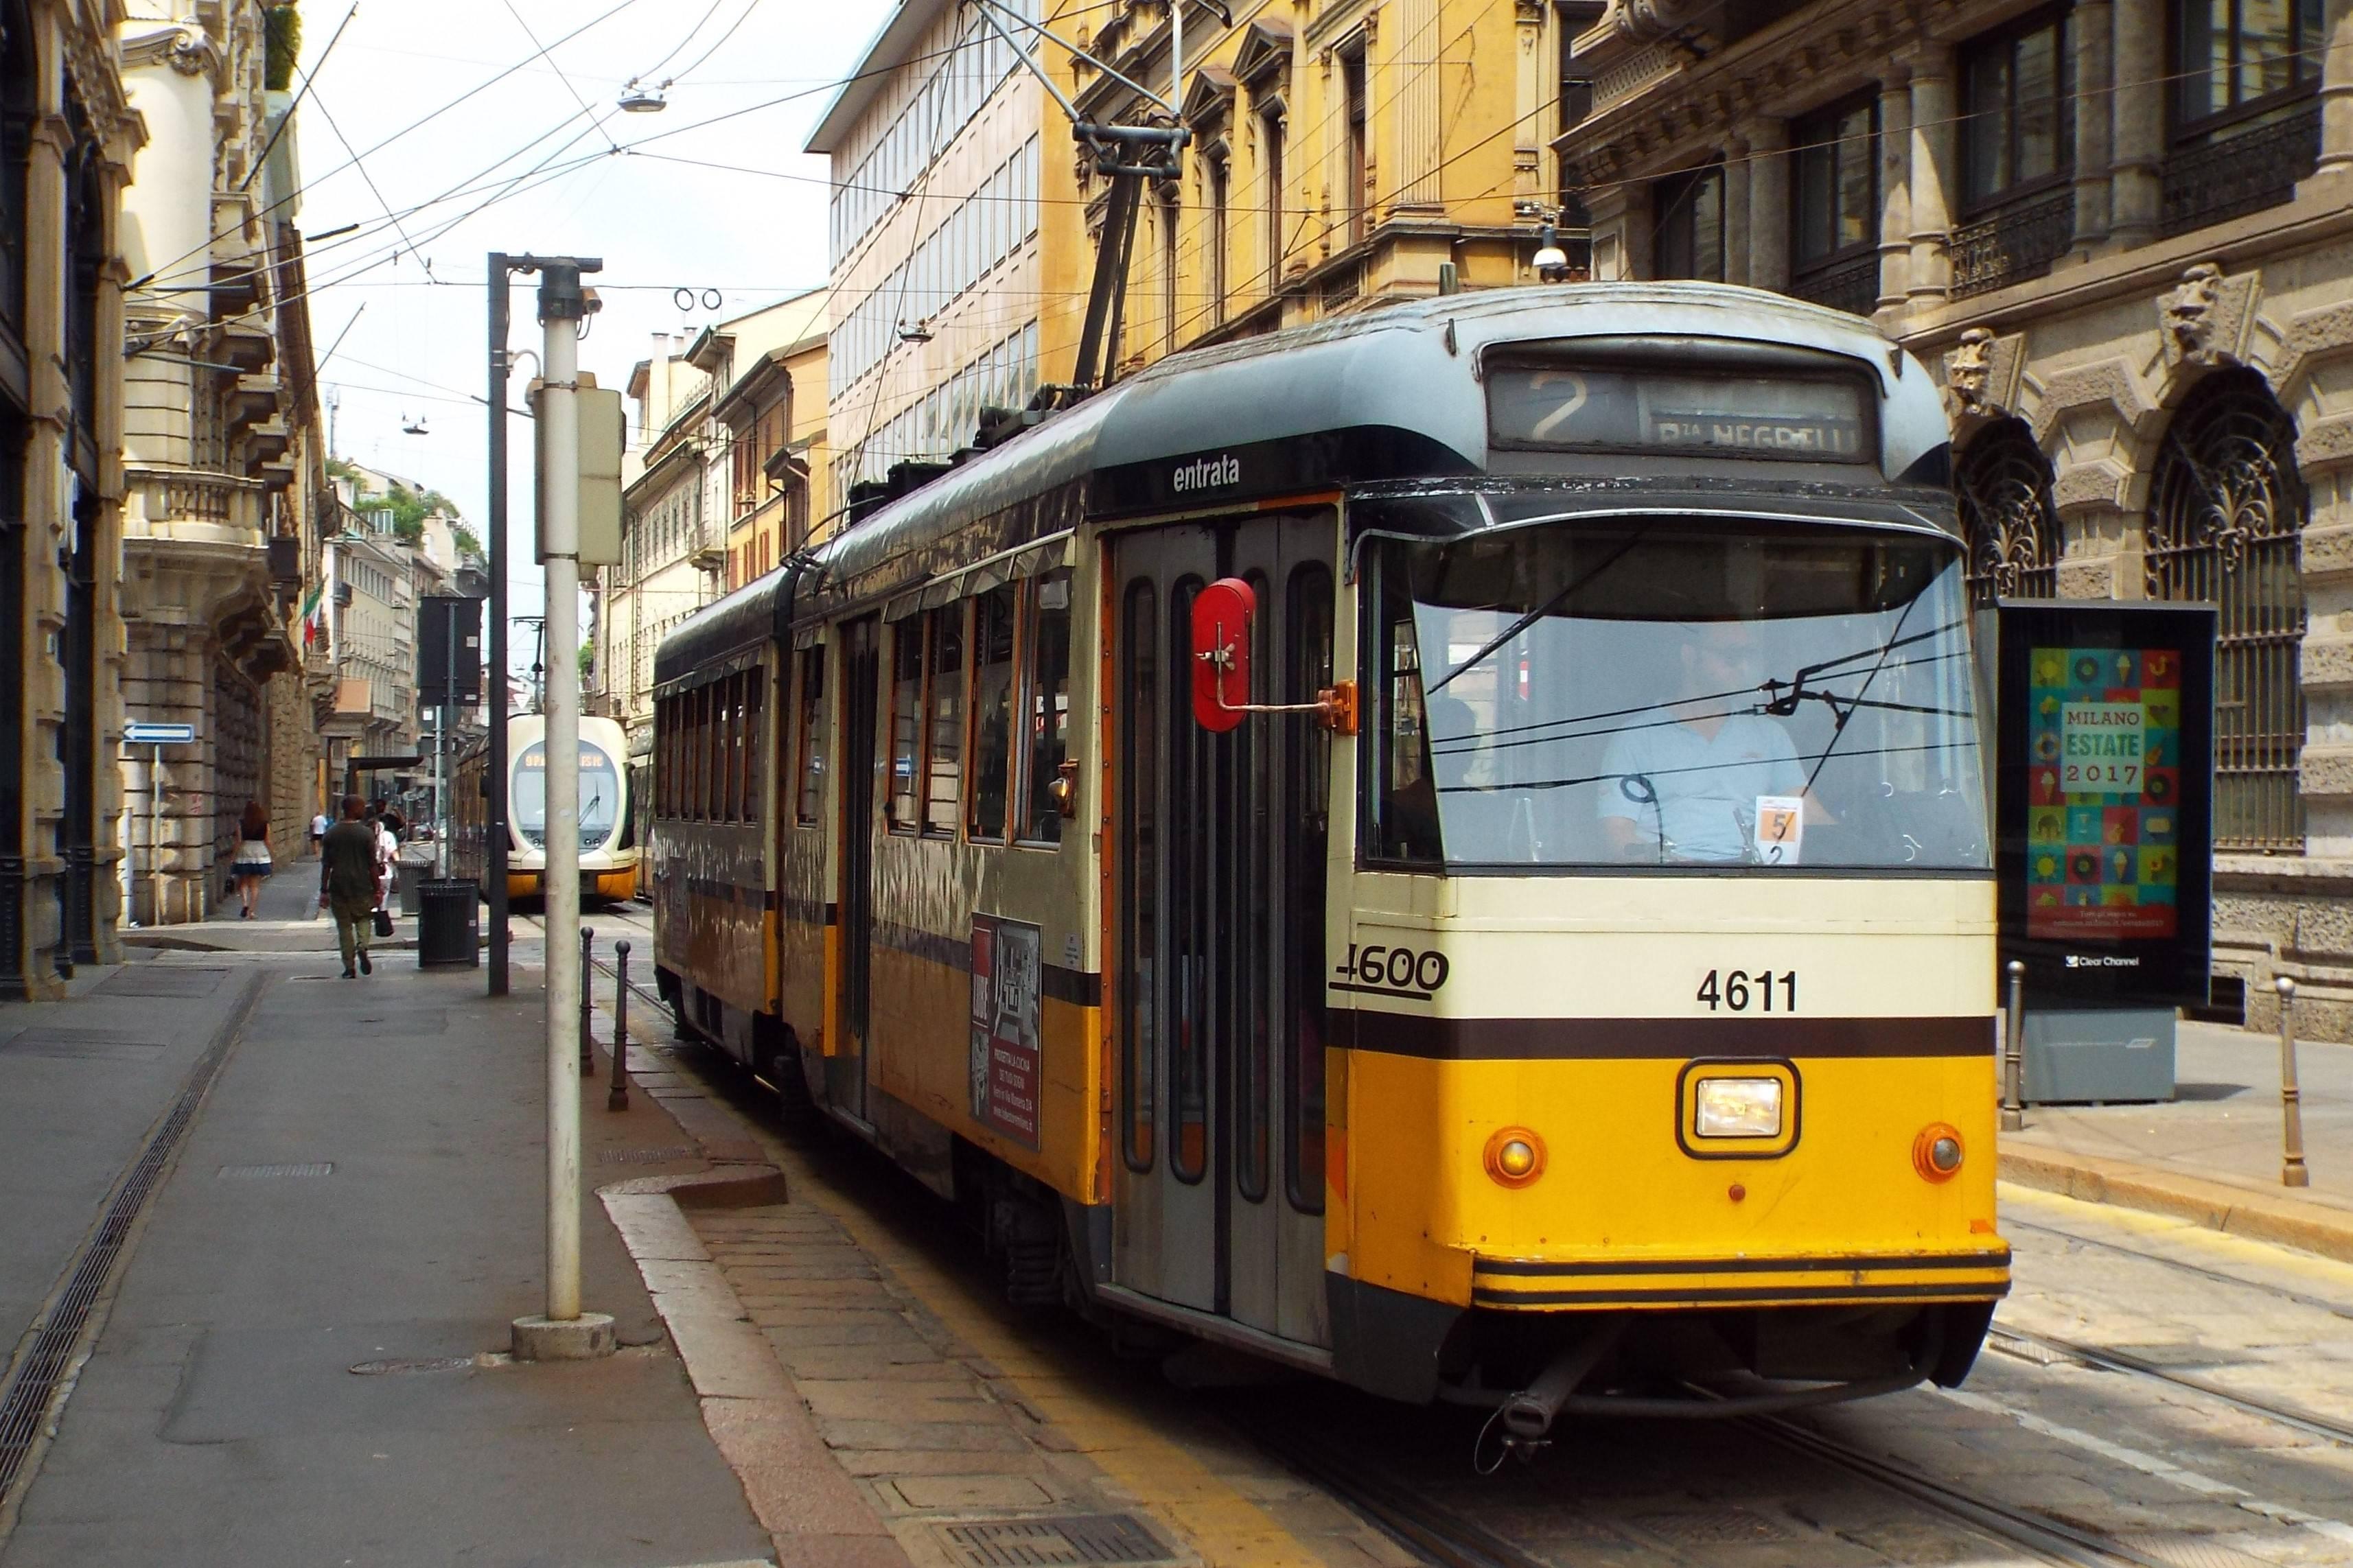 A Series 4600 Tram